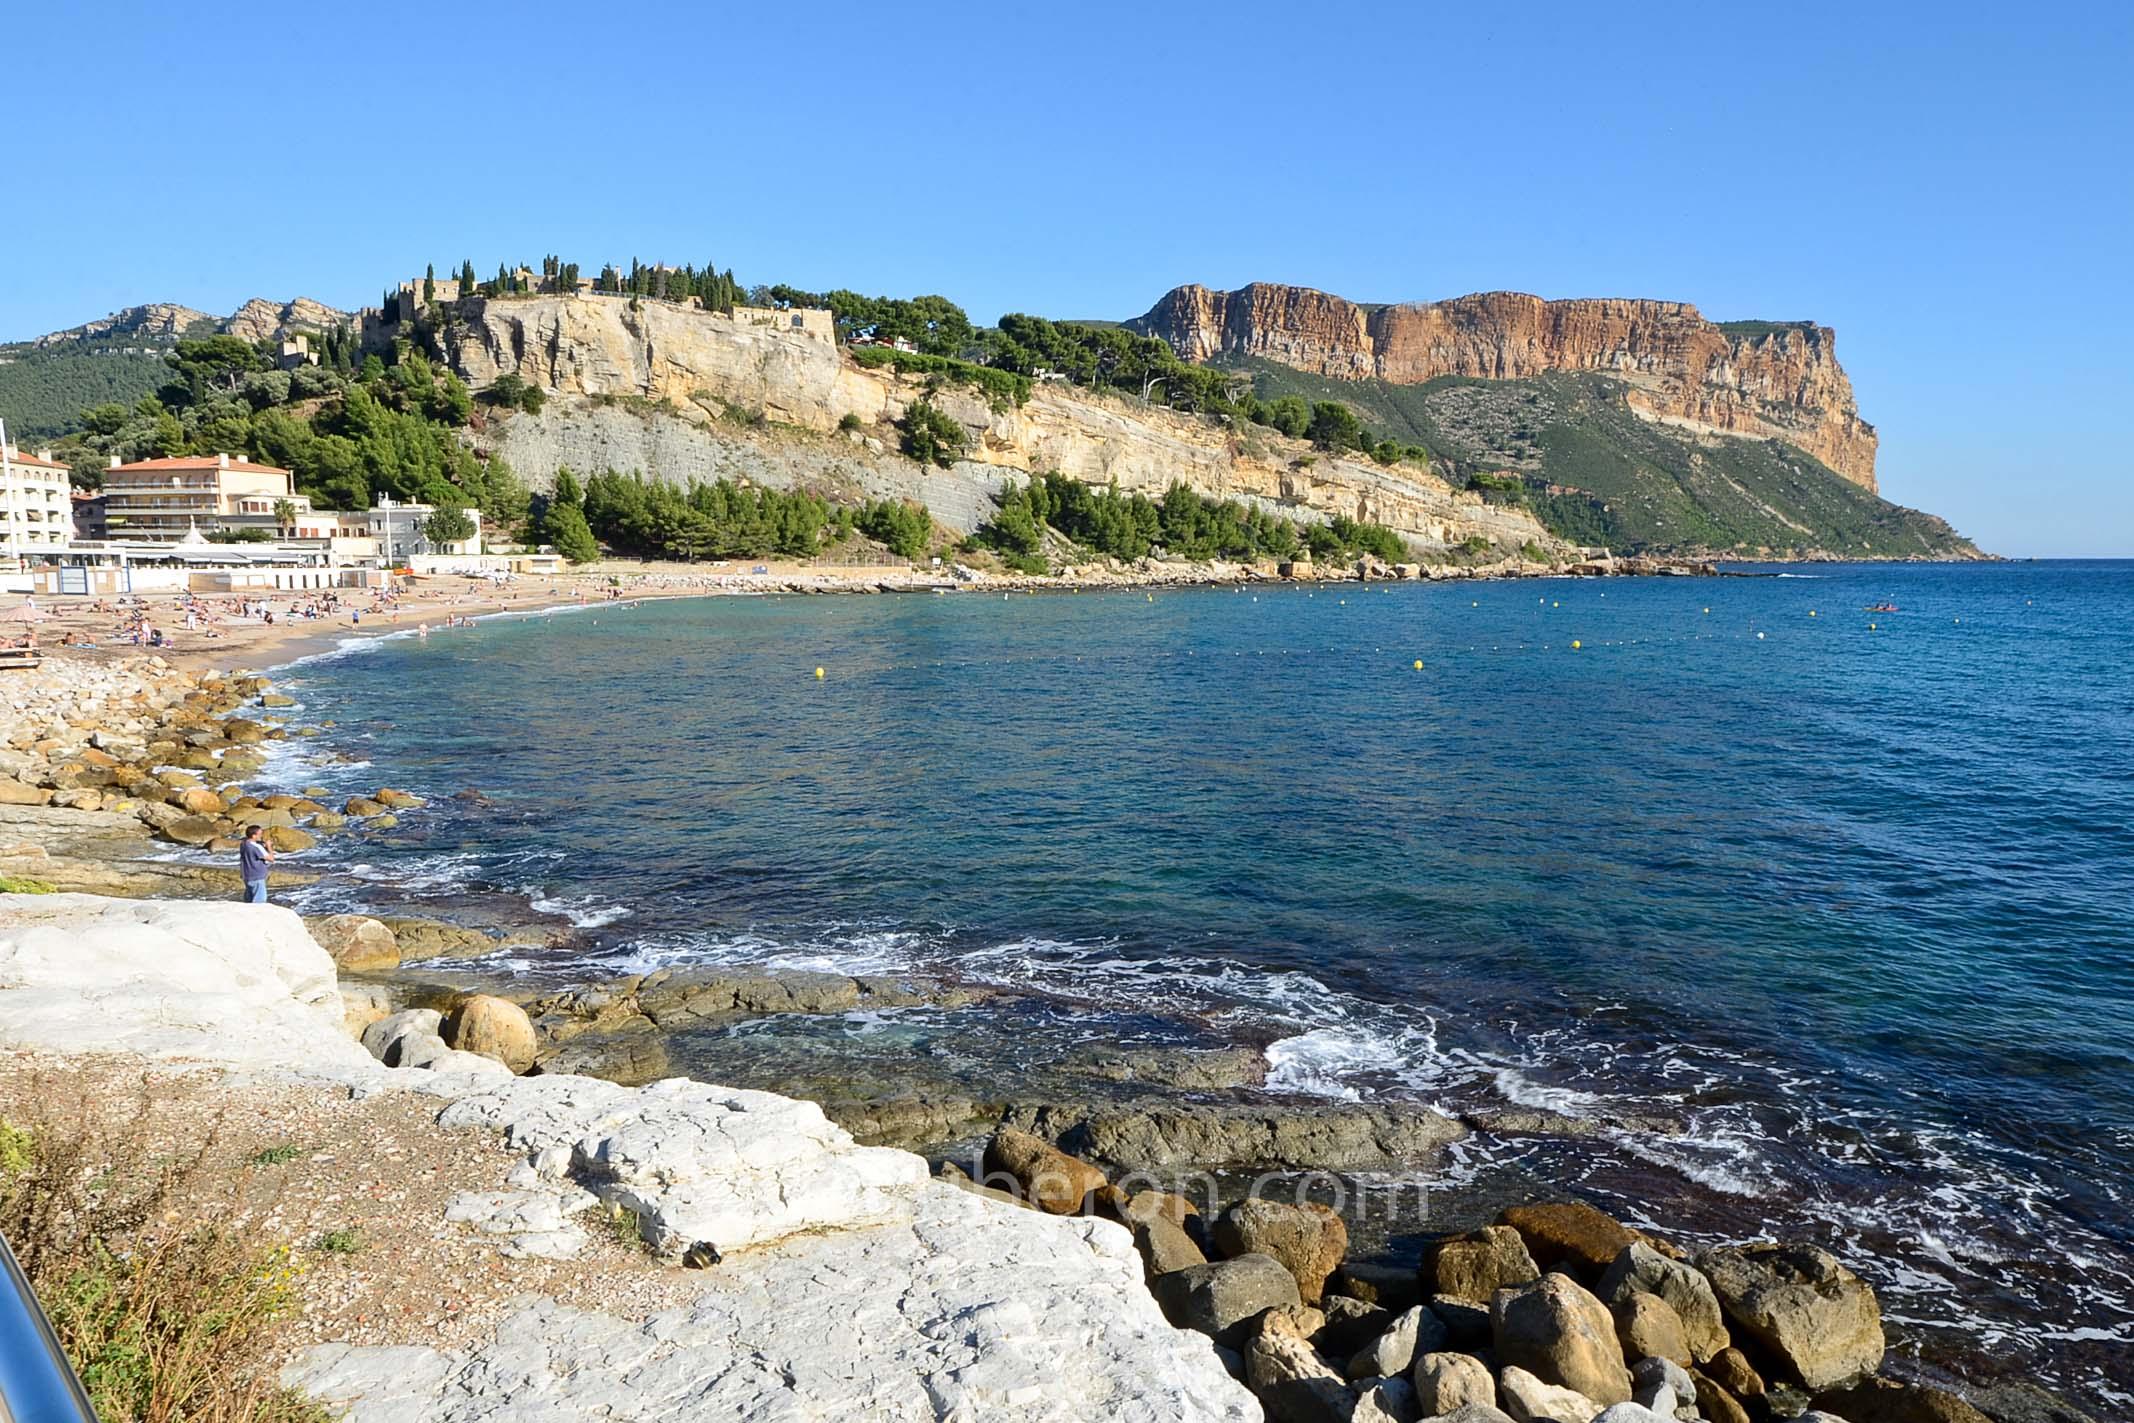 Beach at Cassis